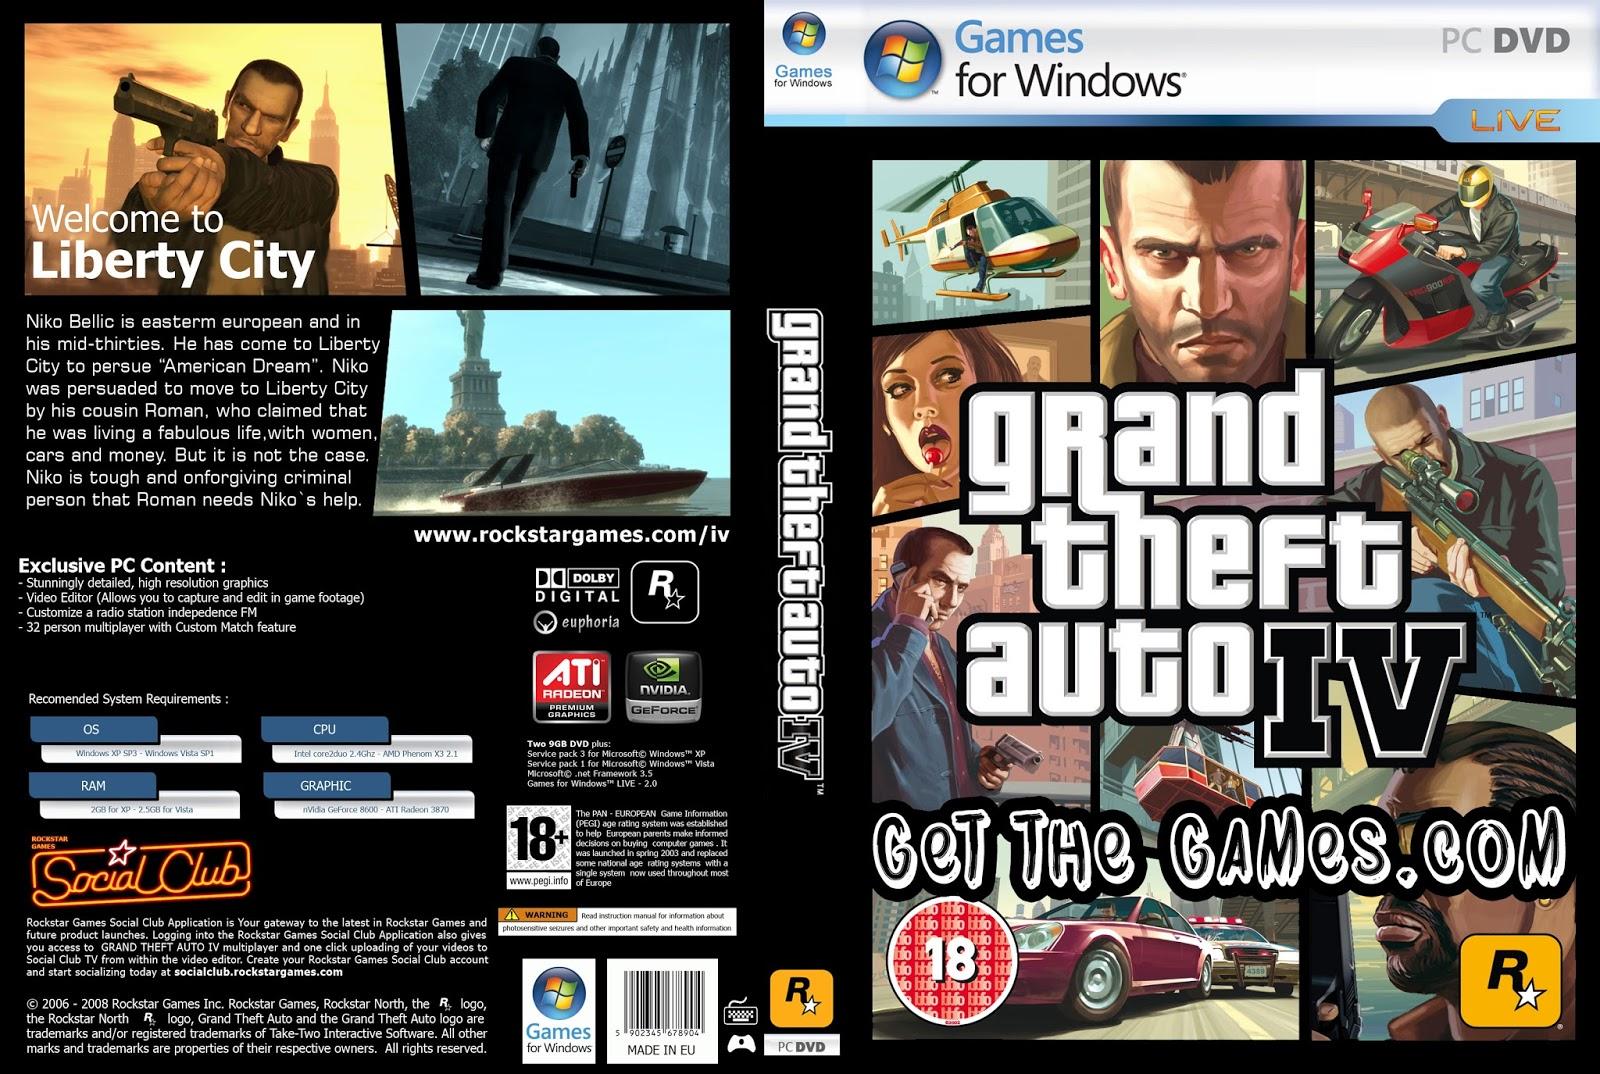 gta 4 download pc windows xp